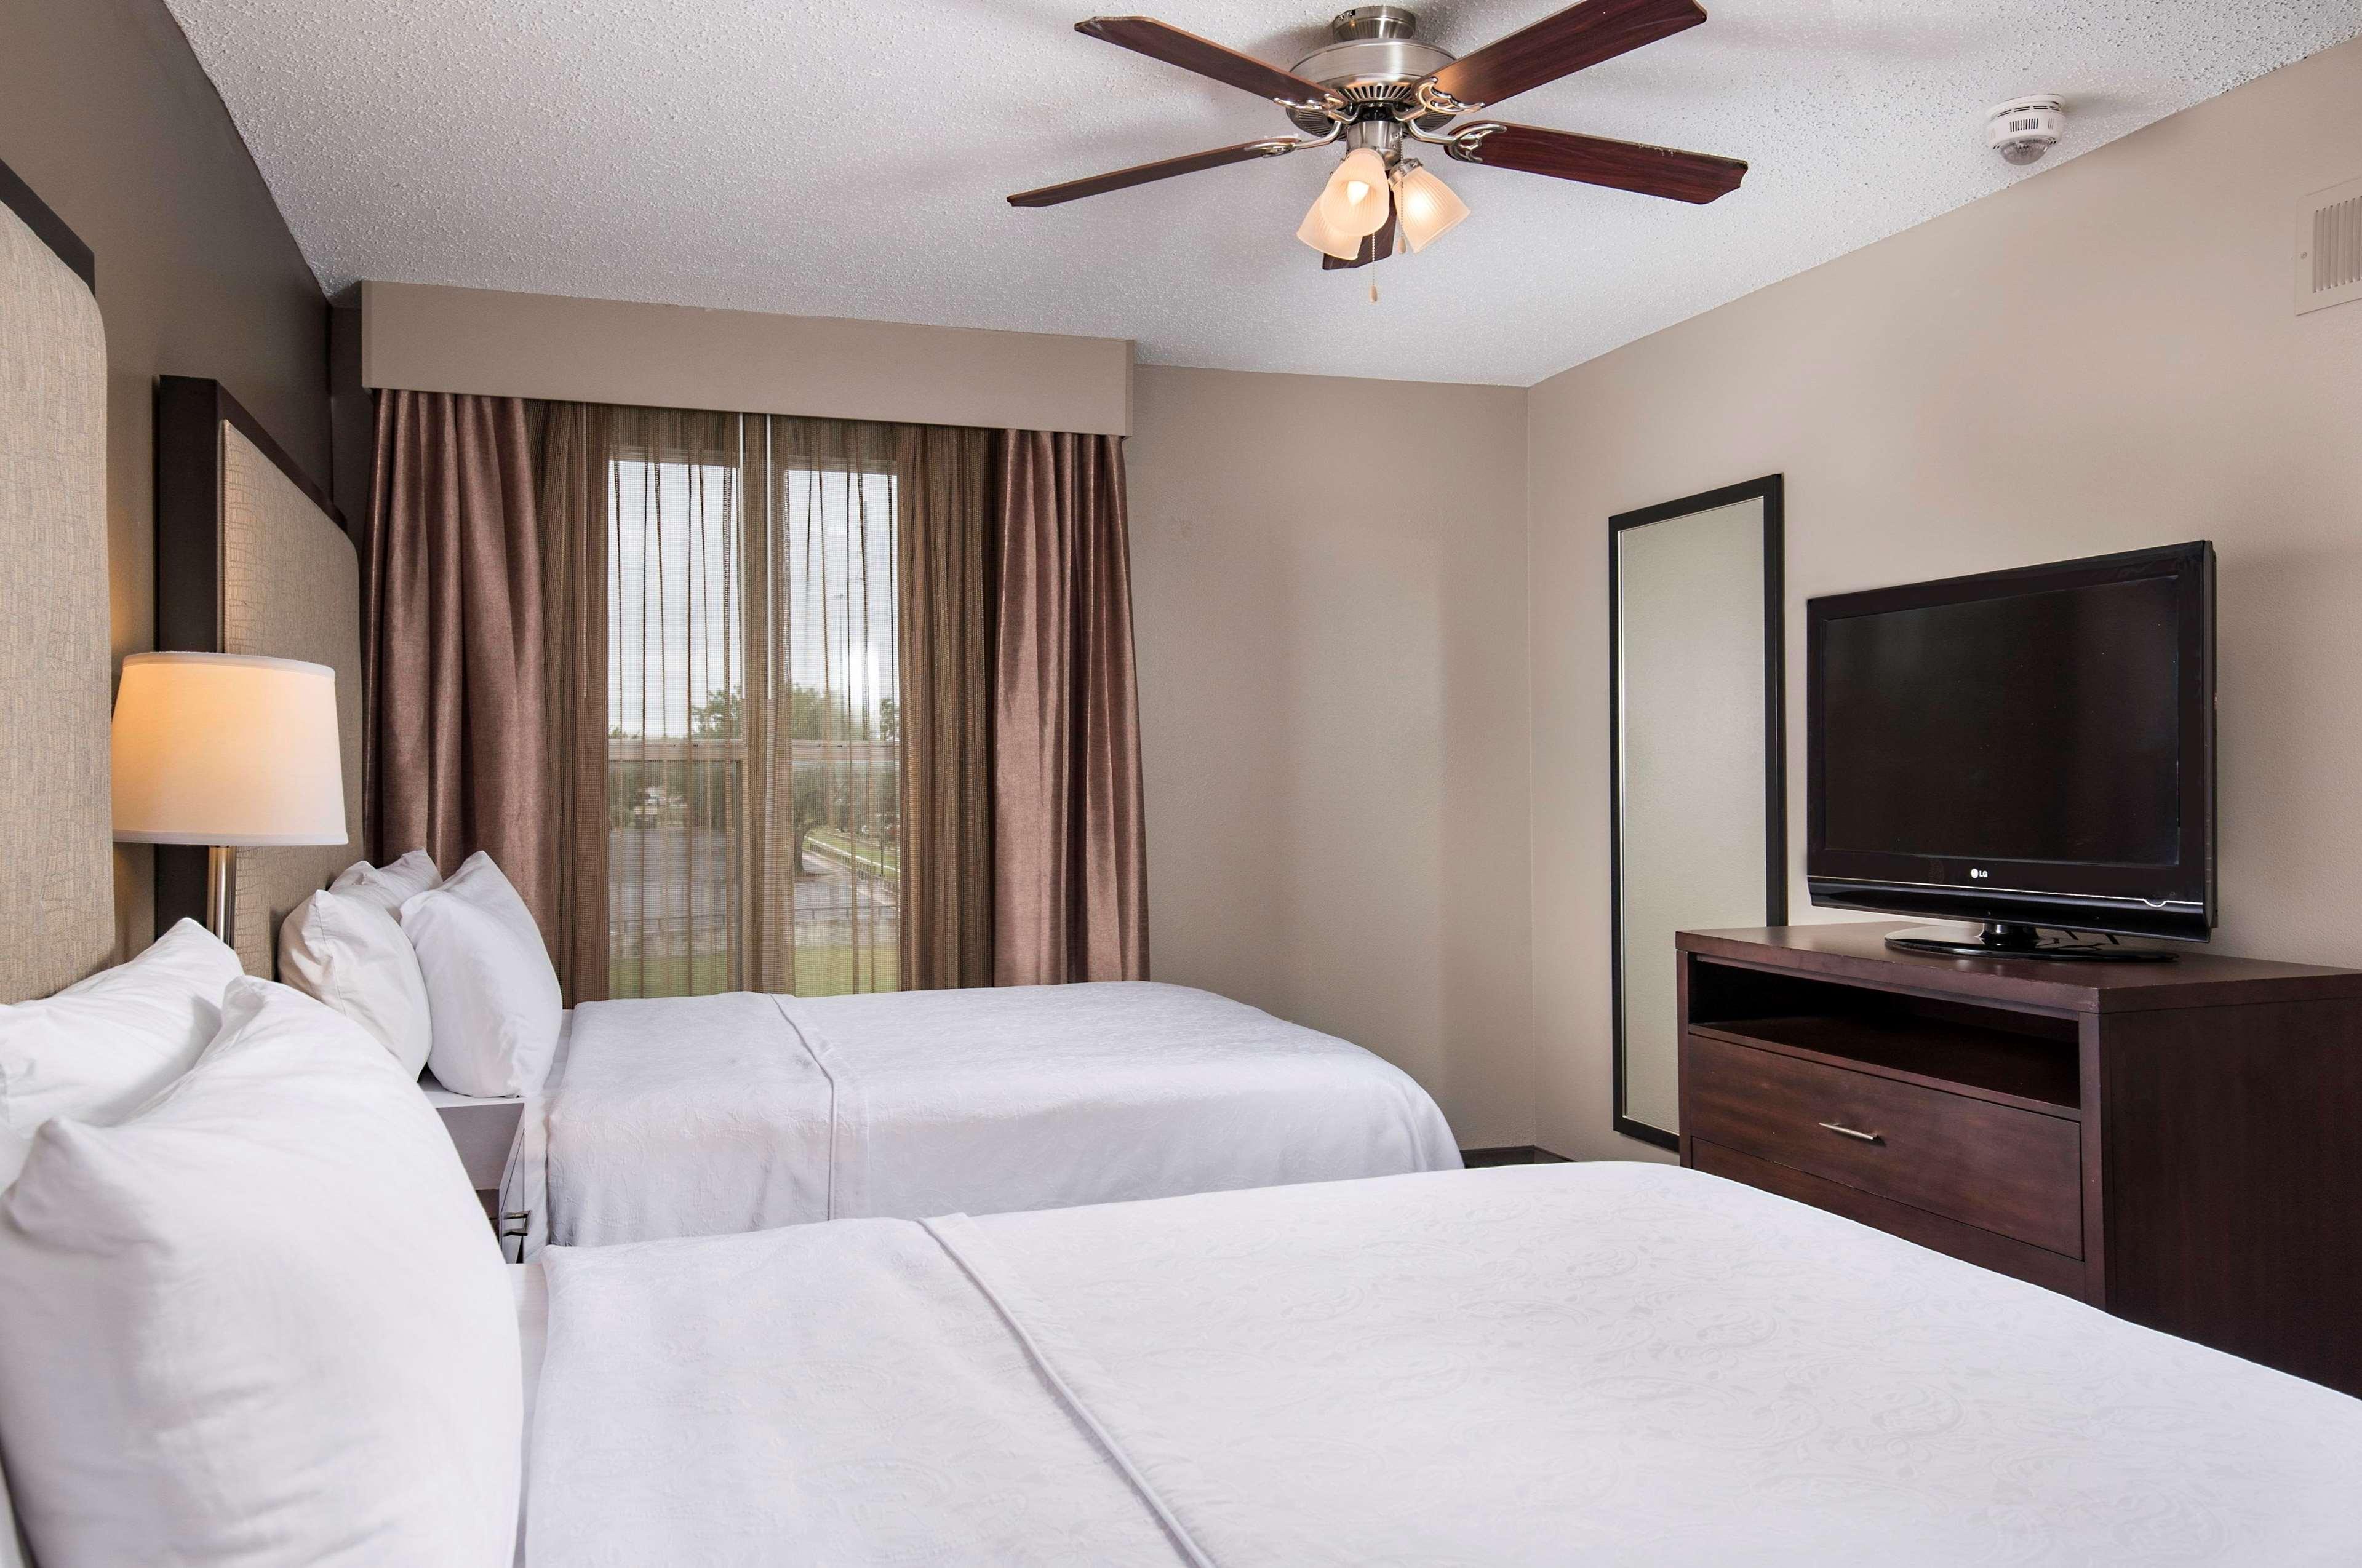 Homewood Suites by Hilton Austin-South/Airport image 9